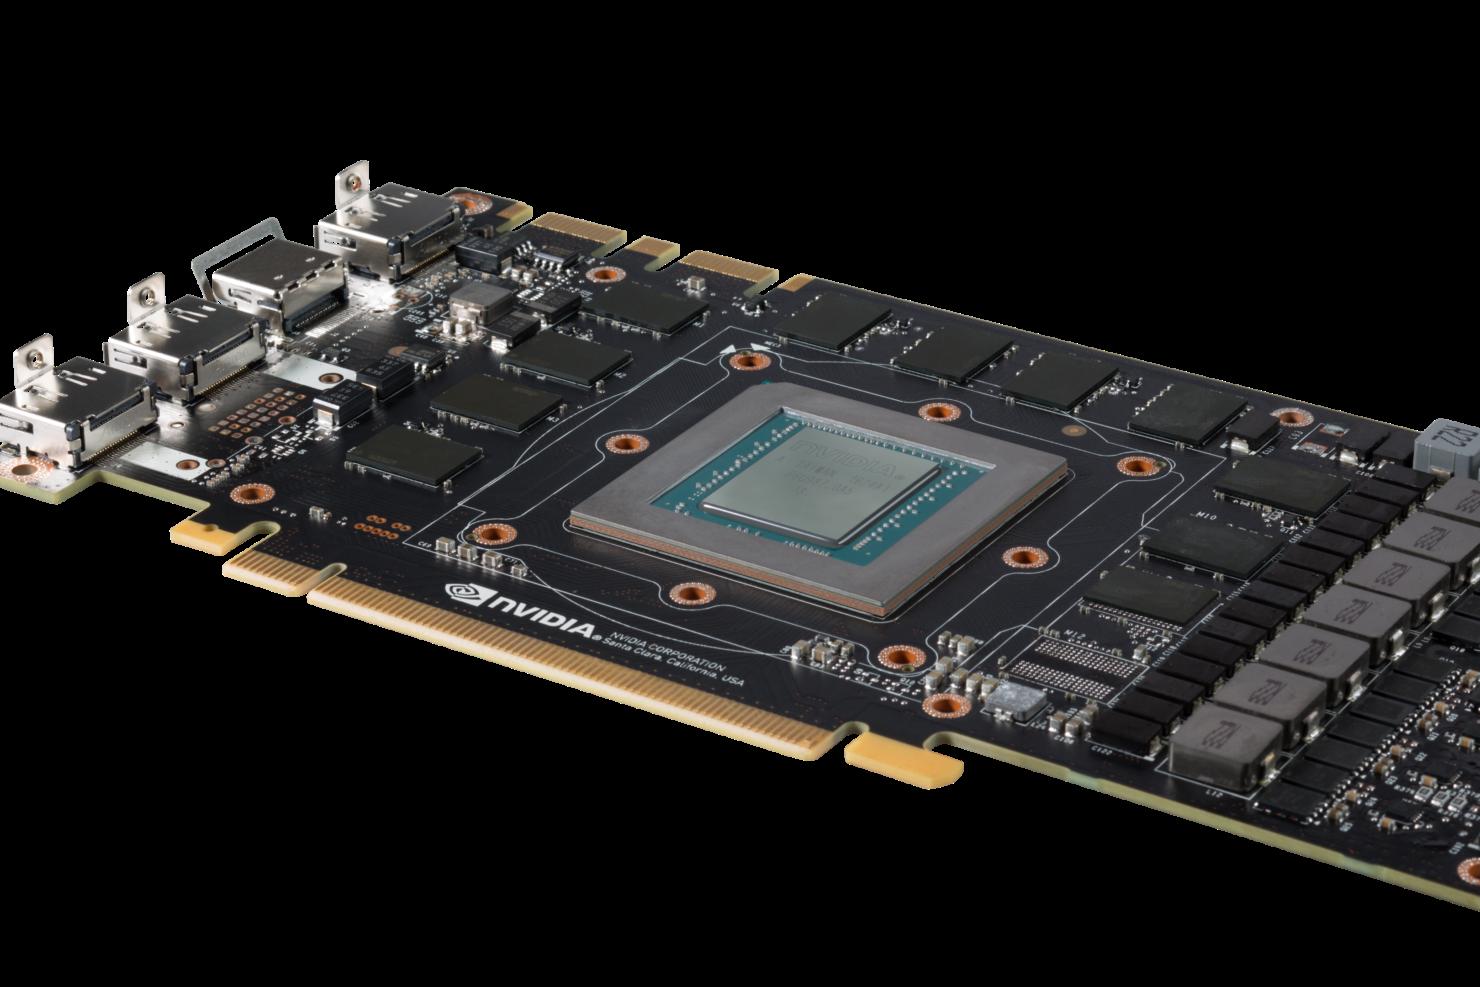 nvidia-geforce-gtx-1080-ti_10-custom